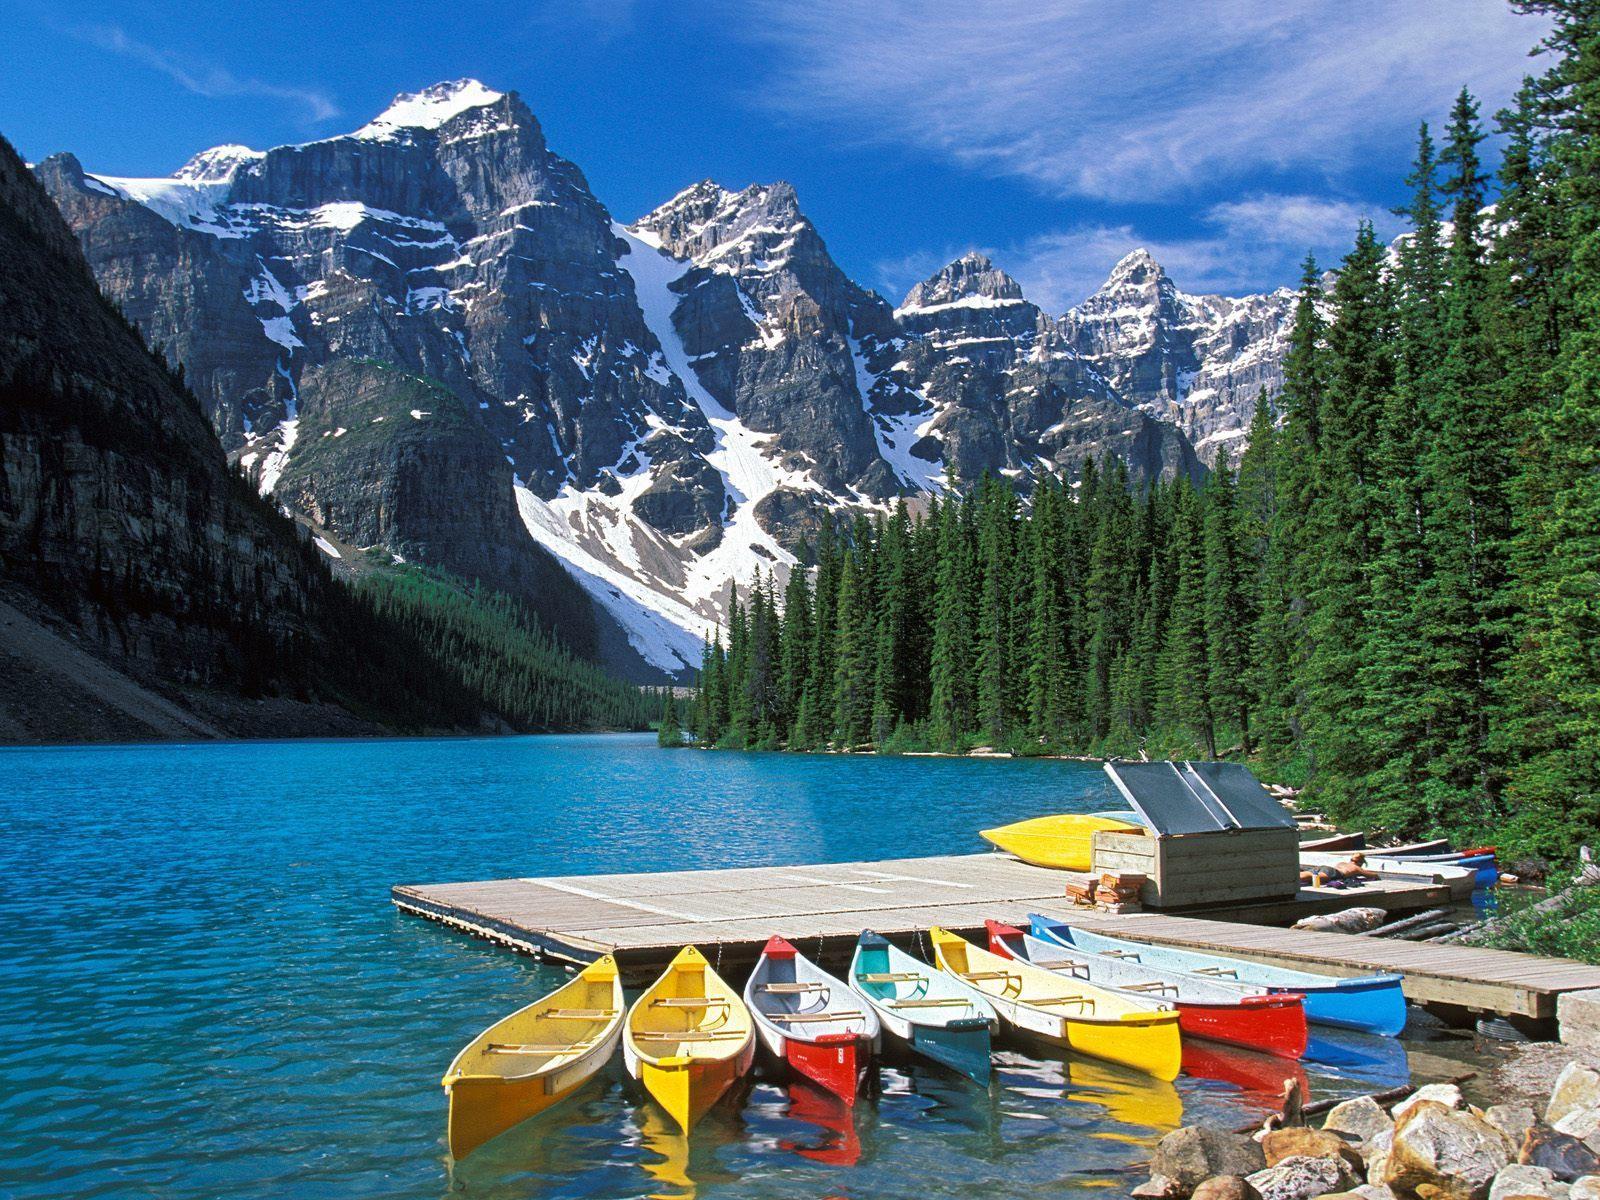 Wallpapers Backgrounds   Lake Canada wallpaper desktop backgrounds 1600x1200